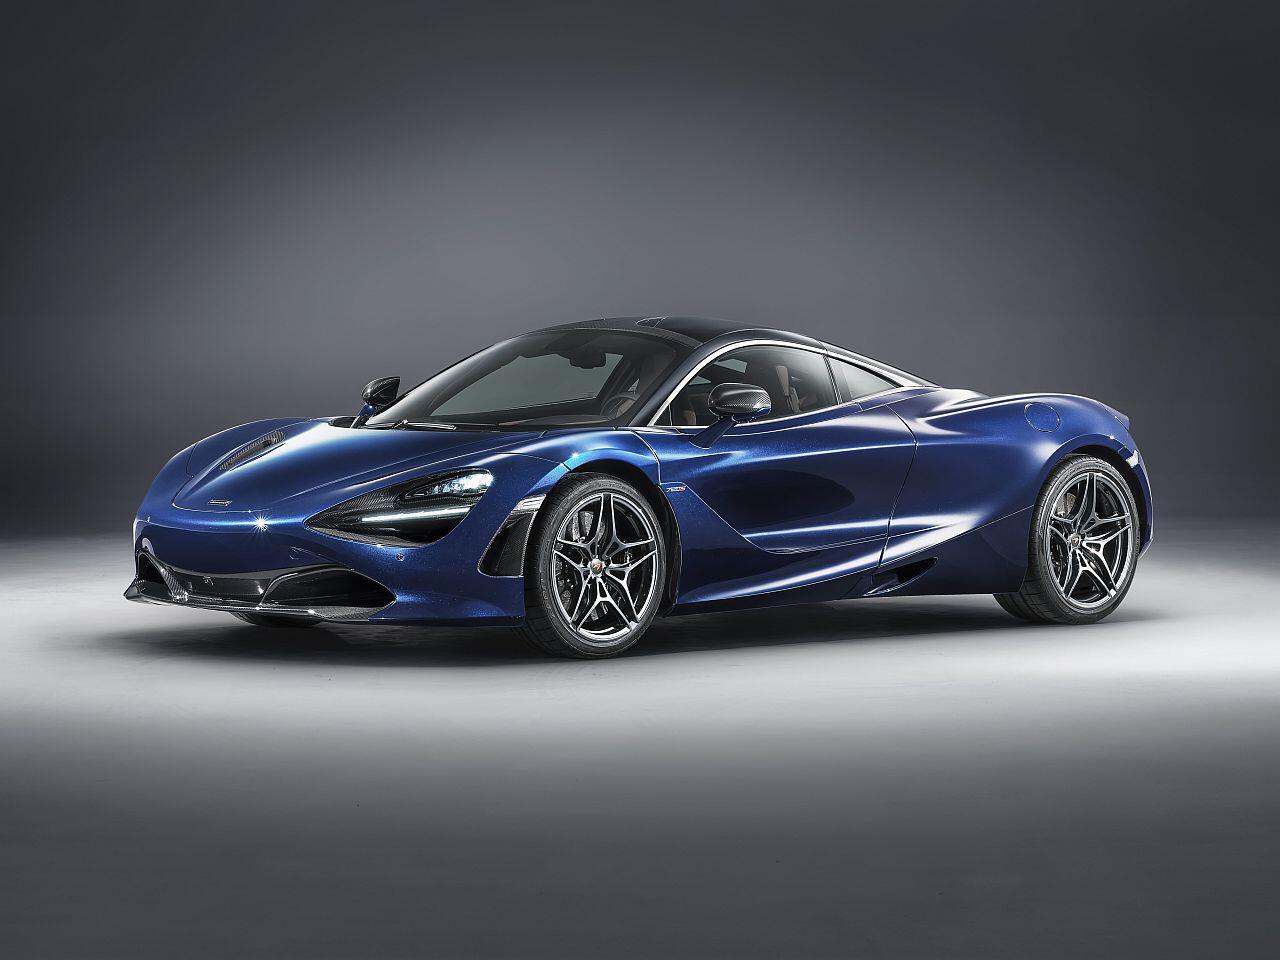 Bild zu McLaren 720S in Atlantic Blue by MSO